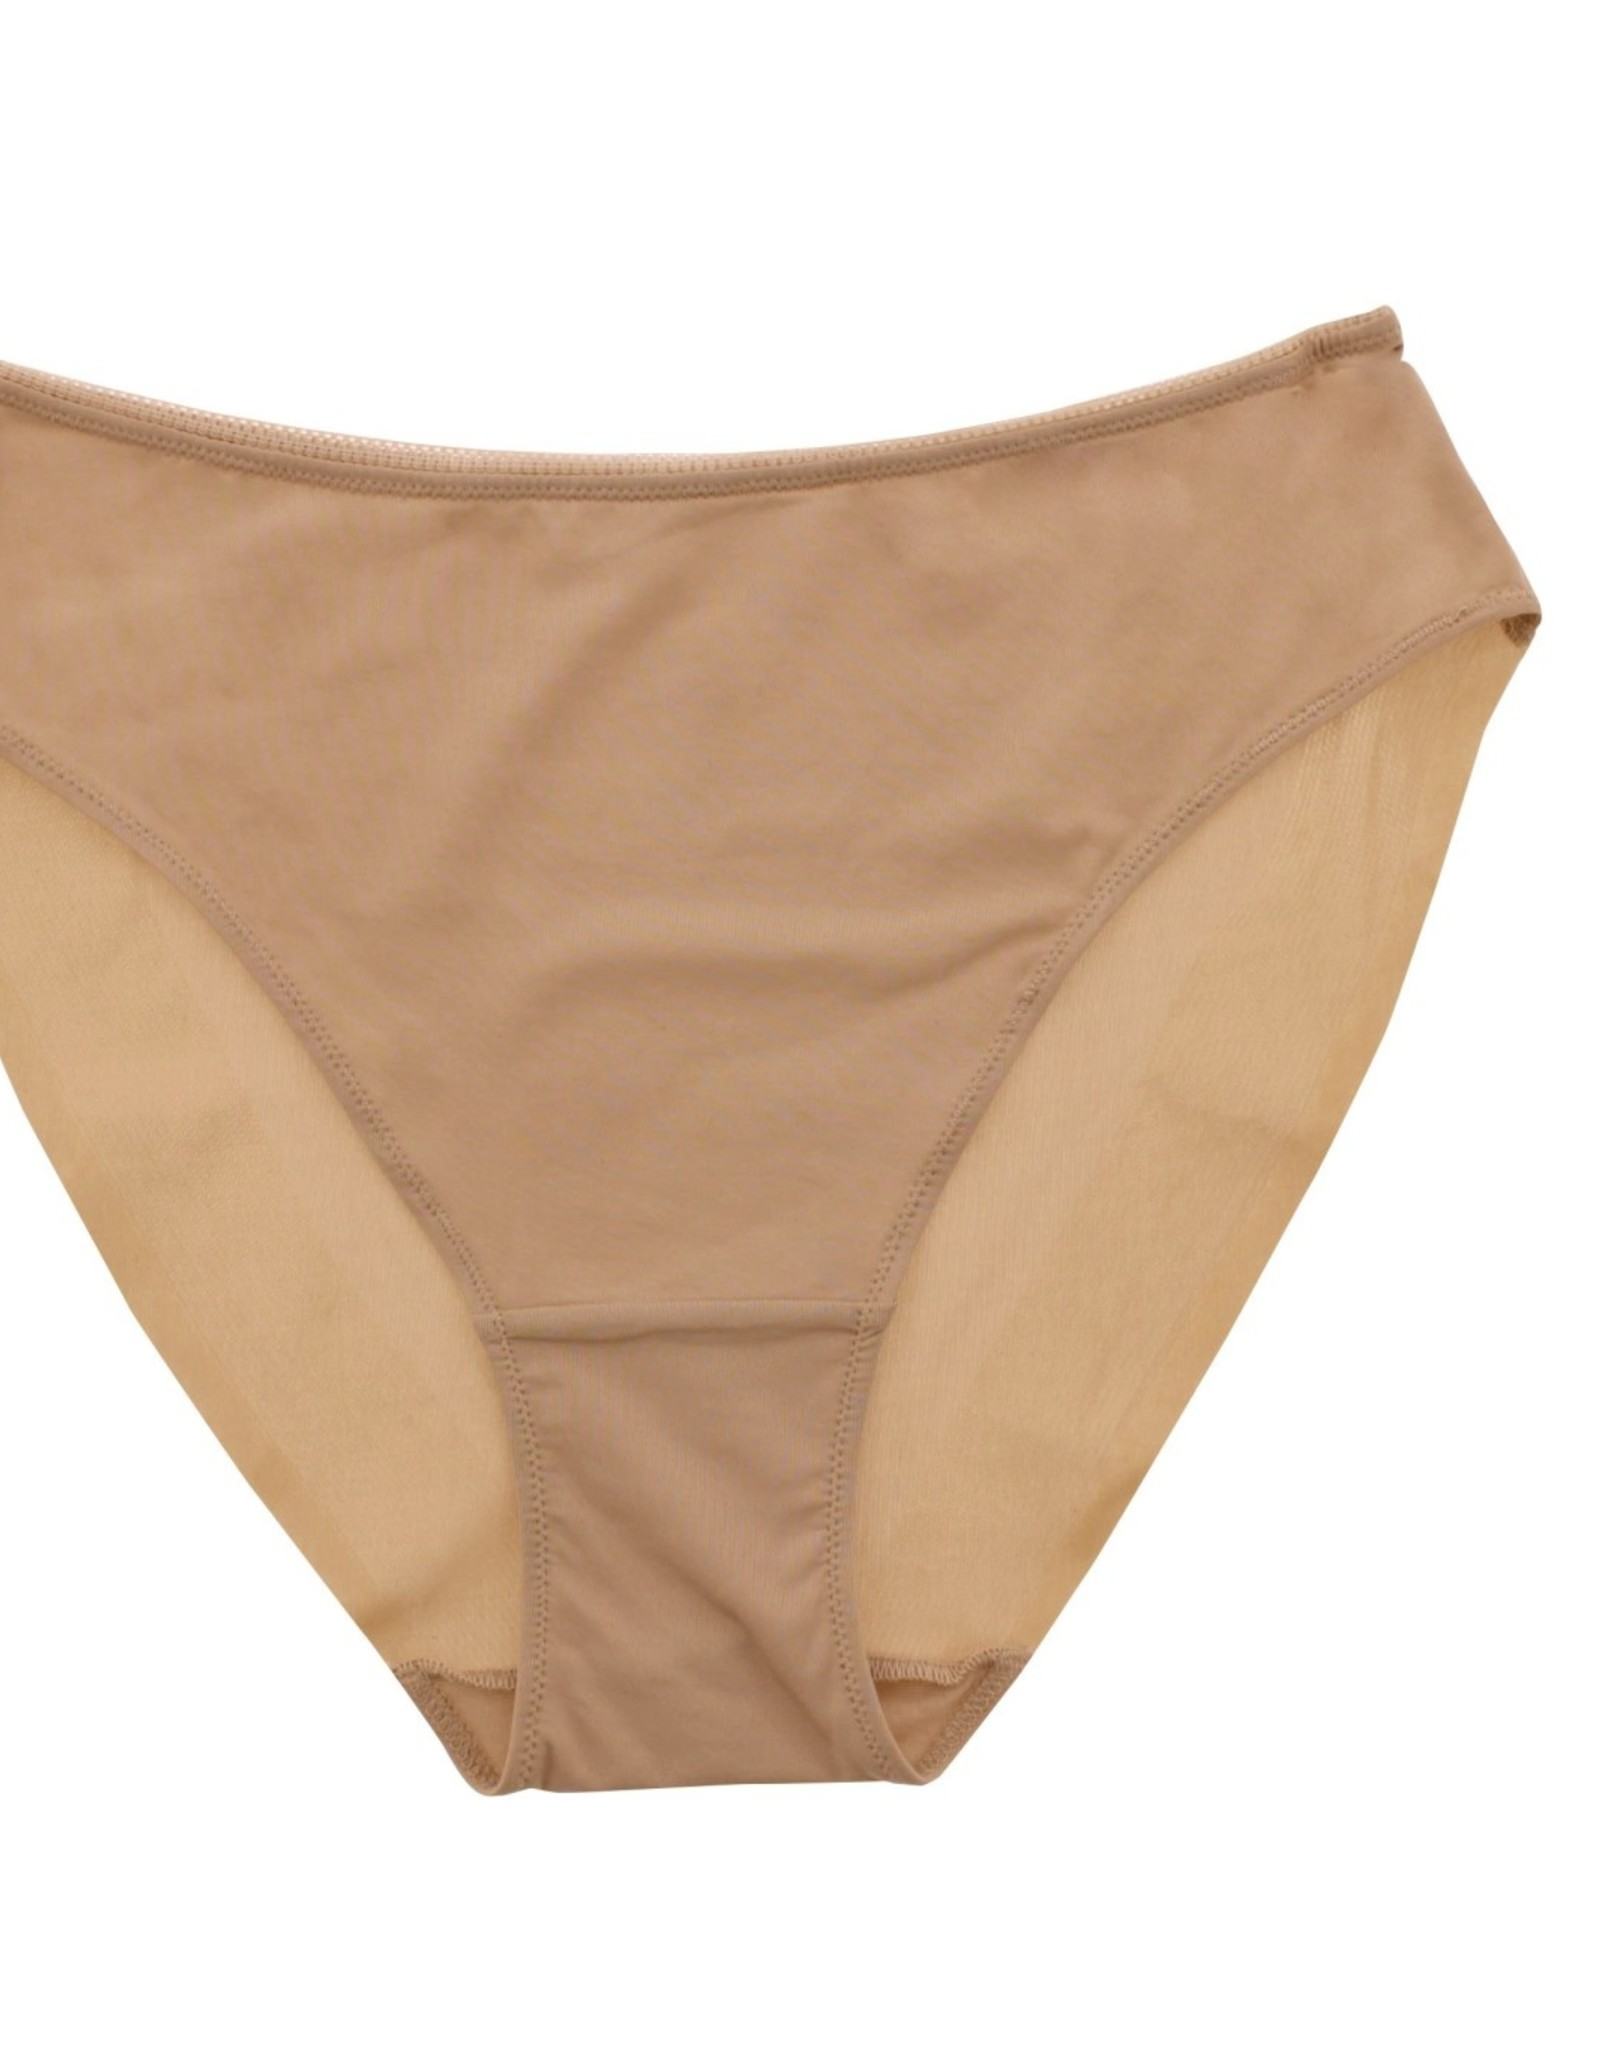 Montelle MO Nudies Modern Brief